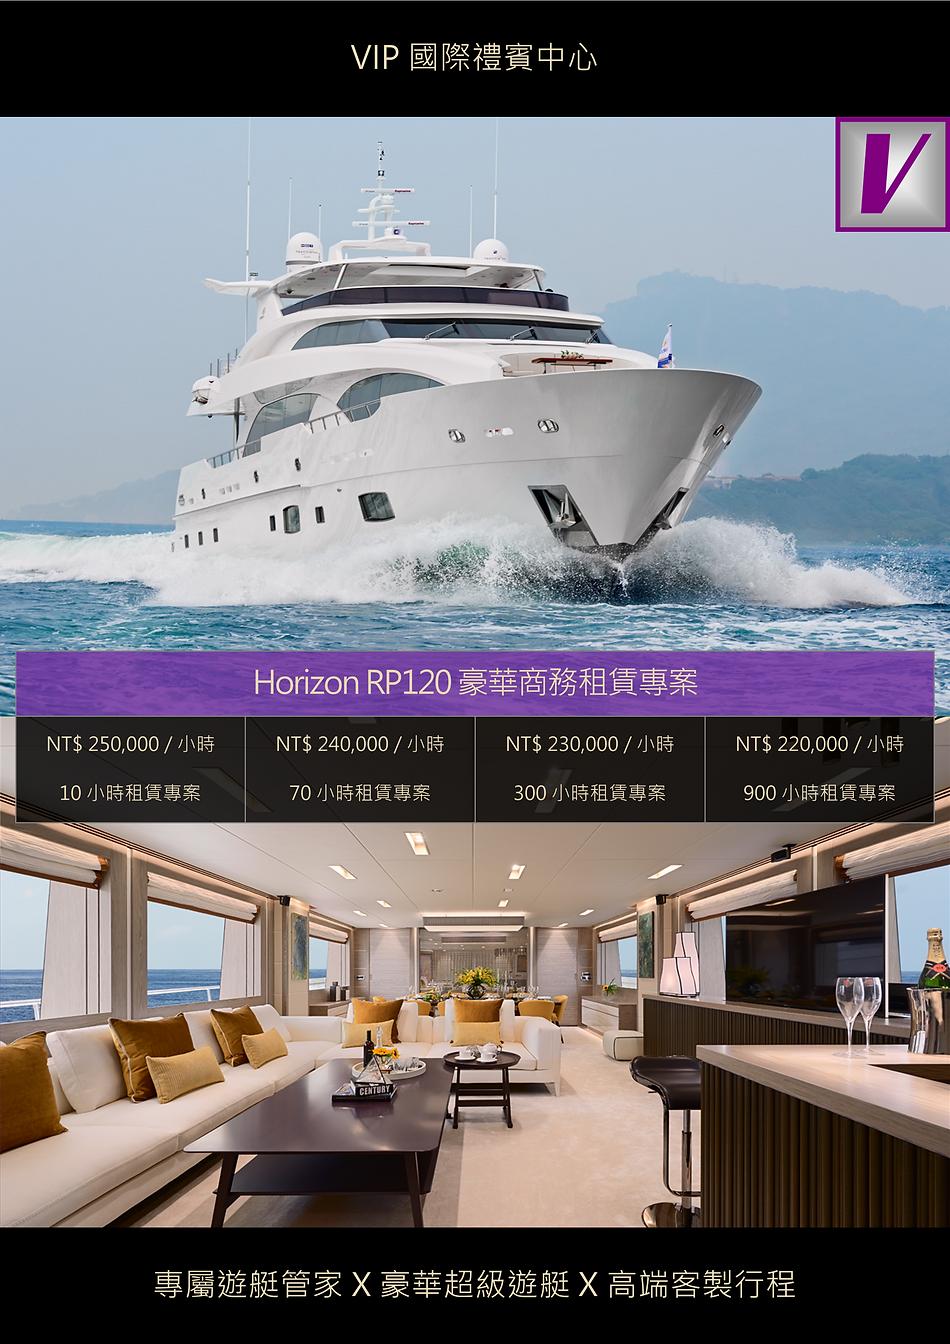 VIP國際禮賓中心 HORIZON RP120 豪華商務租賃專案 DM.png